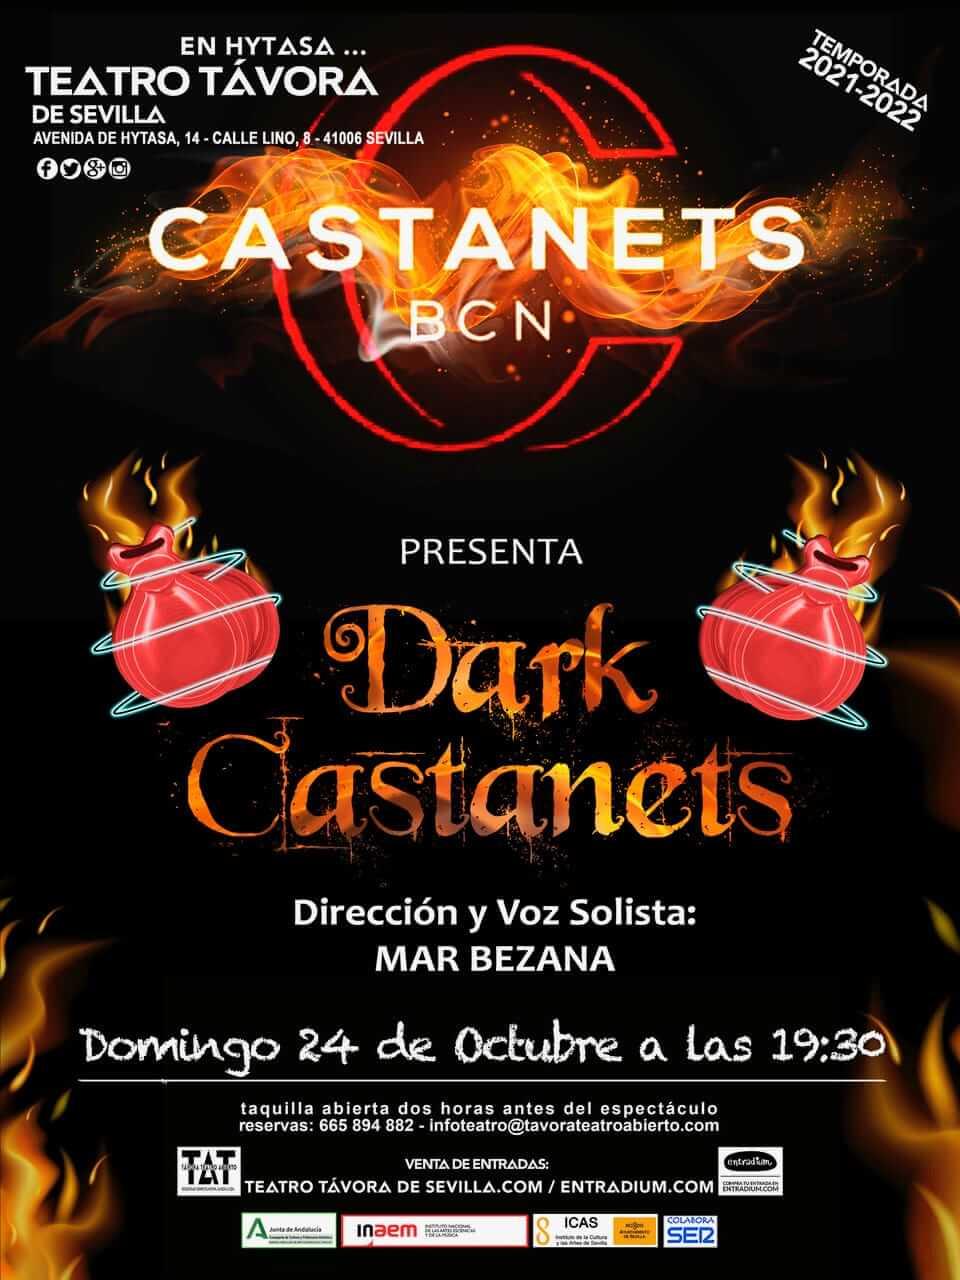 CASTANETS BCN Teatro Salvador Távora Sevilla 24 de octubre